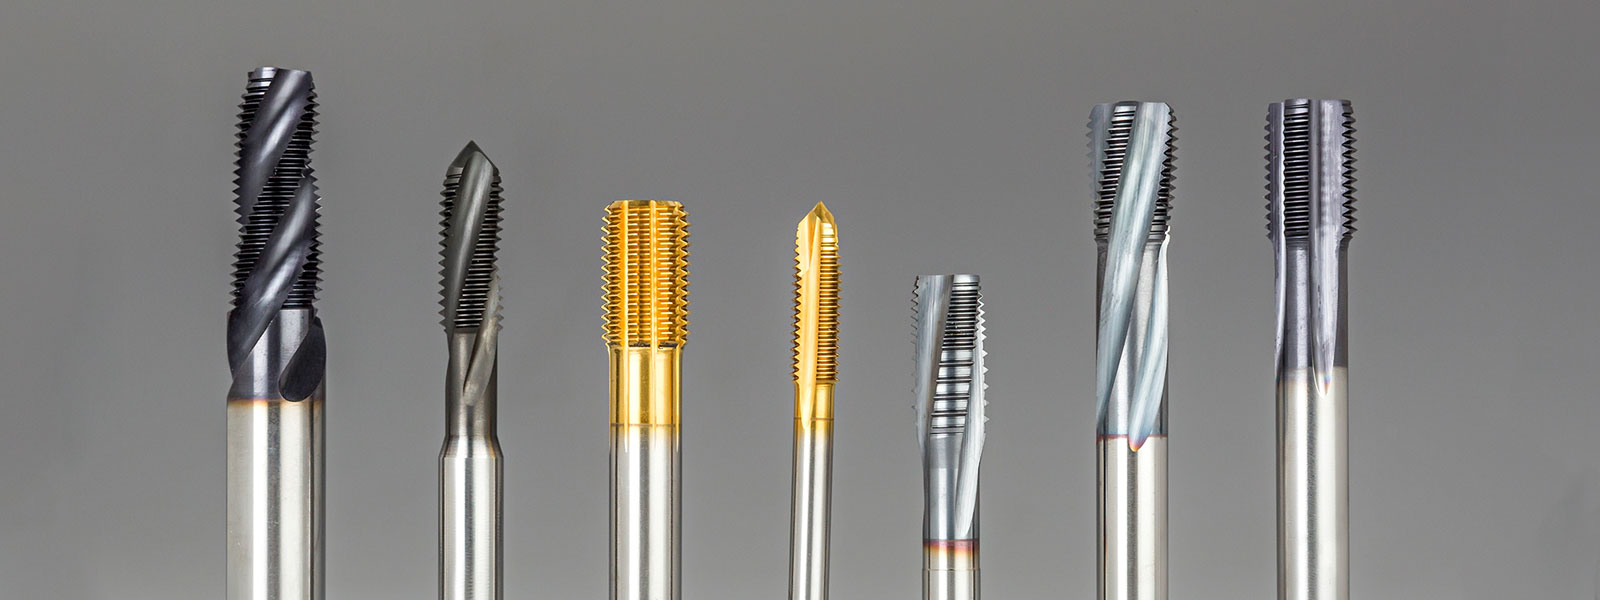 generic face milling cutter